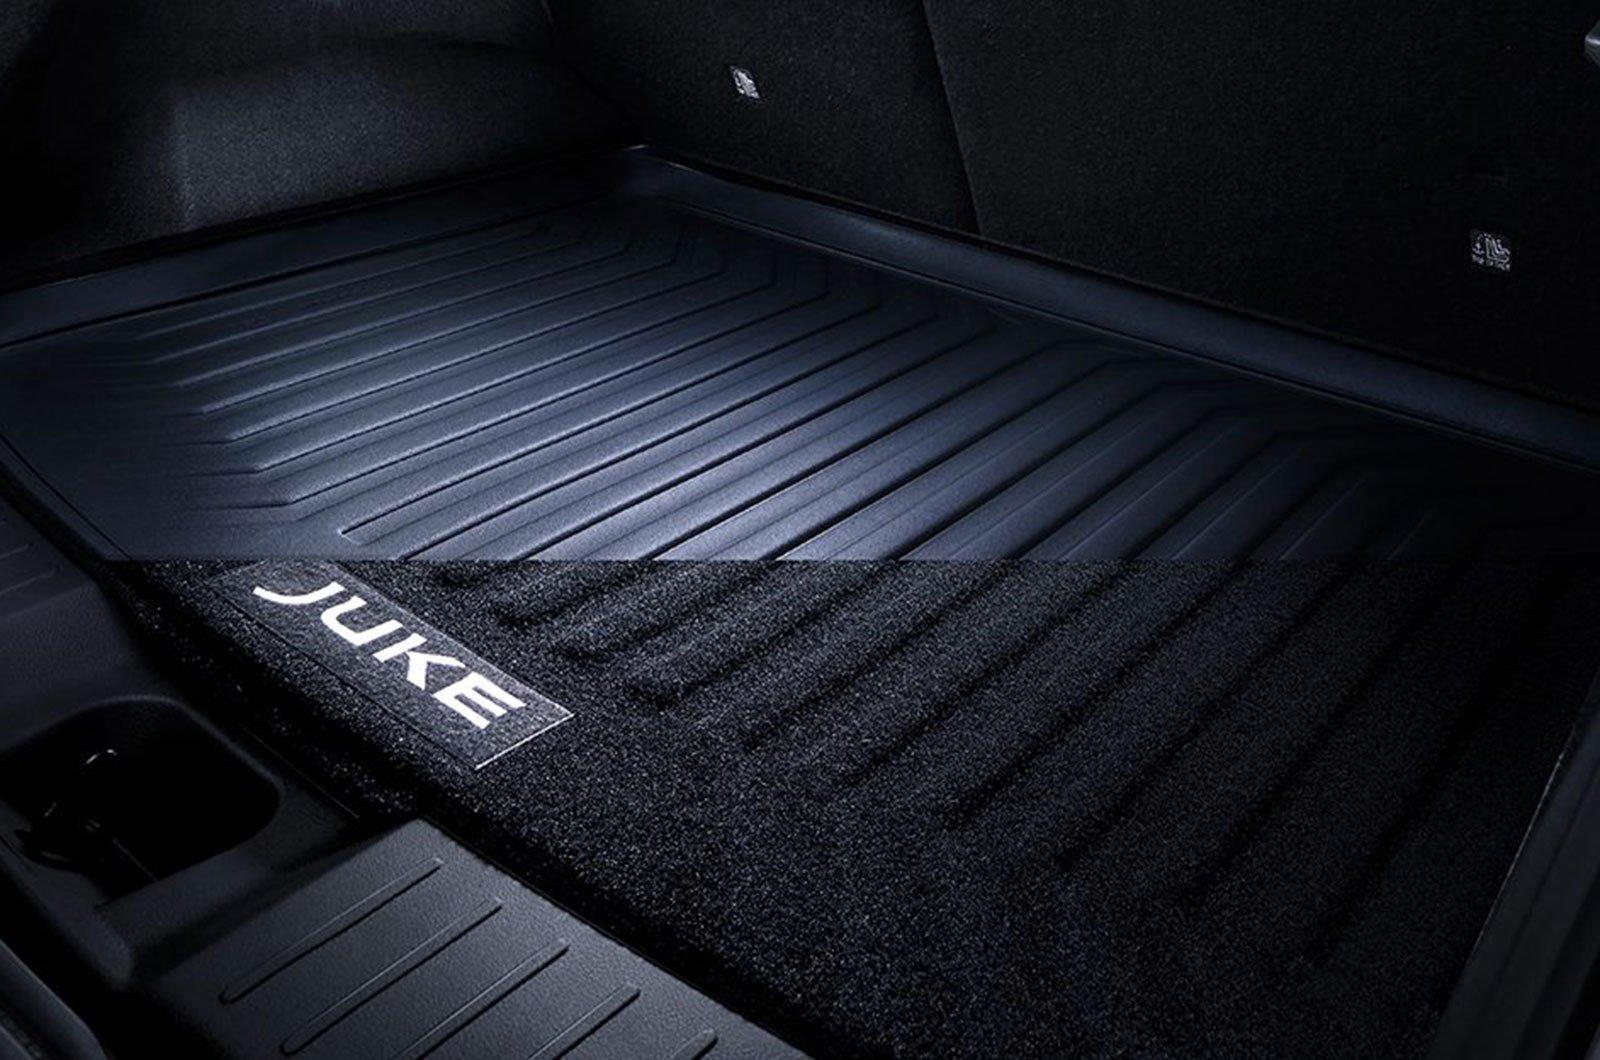 Nissan Juke floor mat